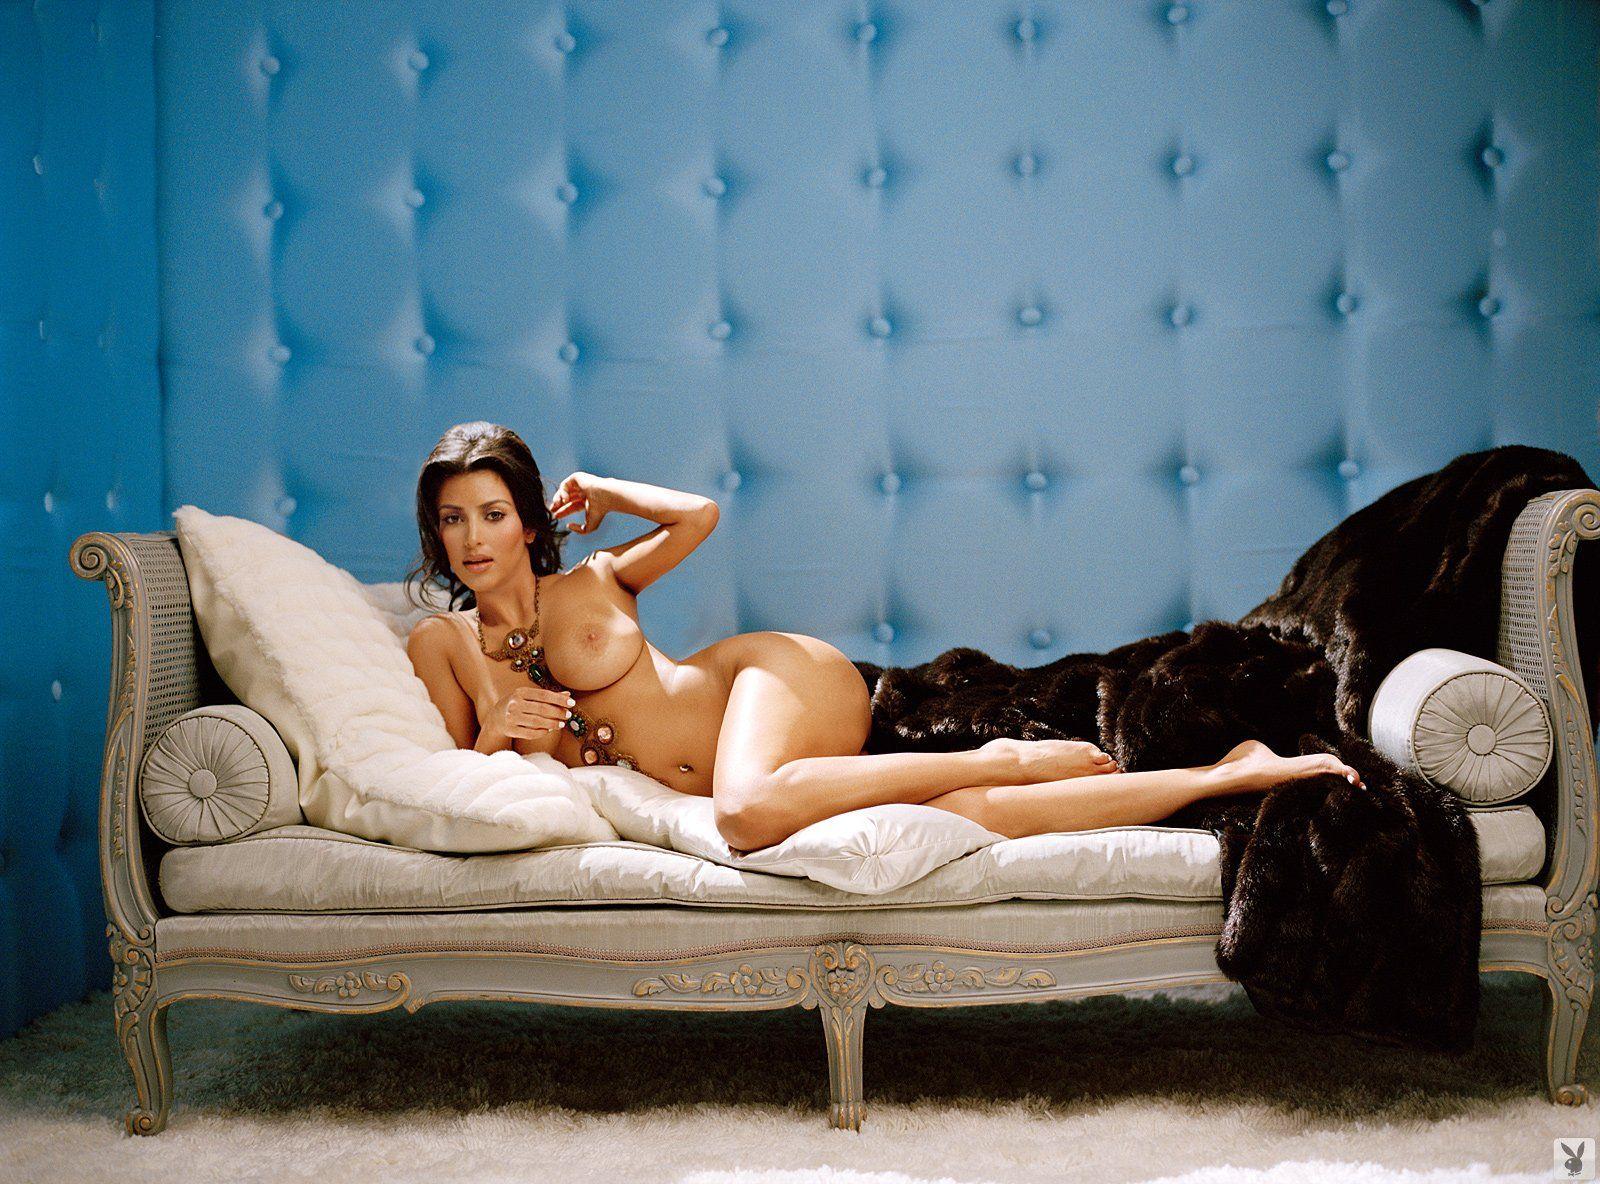 http://4.bp.blogspot.com/-nt-ug03peOw/UOwJHLXkFoI/AAAAAAAABaE/M5jXRyHfgRk/s1600/asianworldonline.blogspot.com+-+Kim+Kardashian+in+Playboy+004.jpg